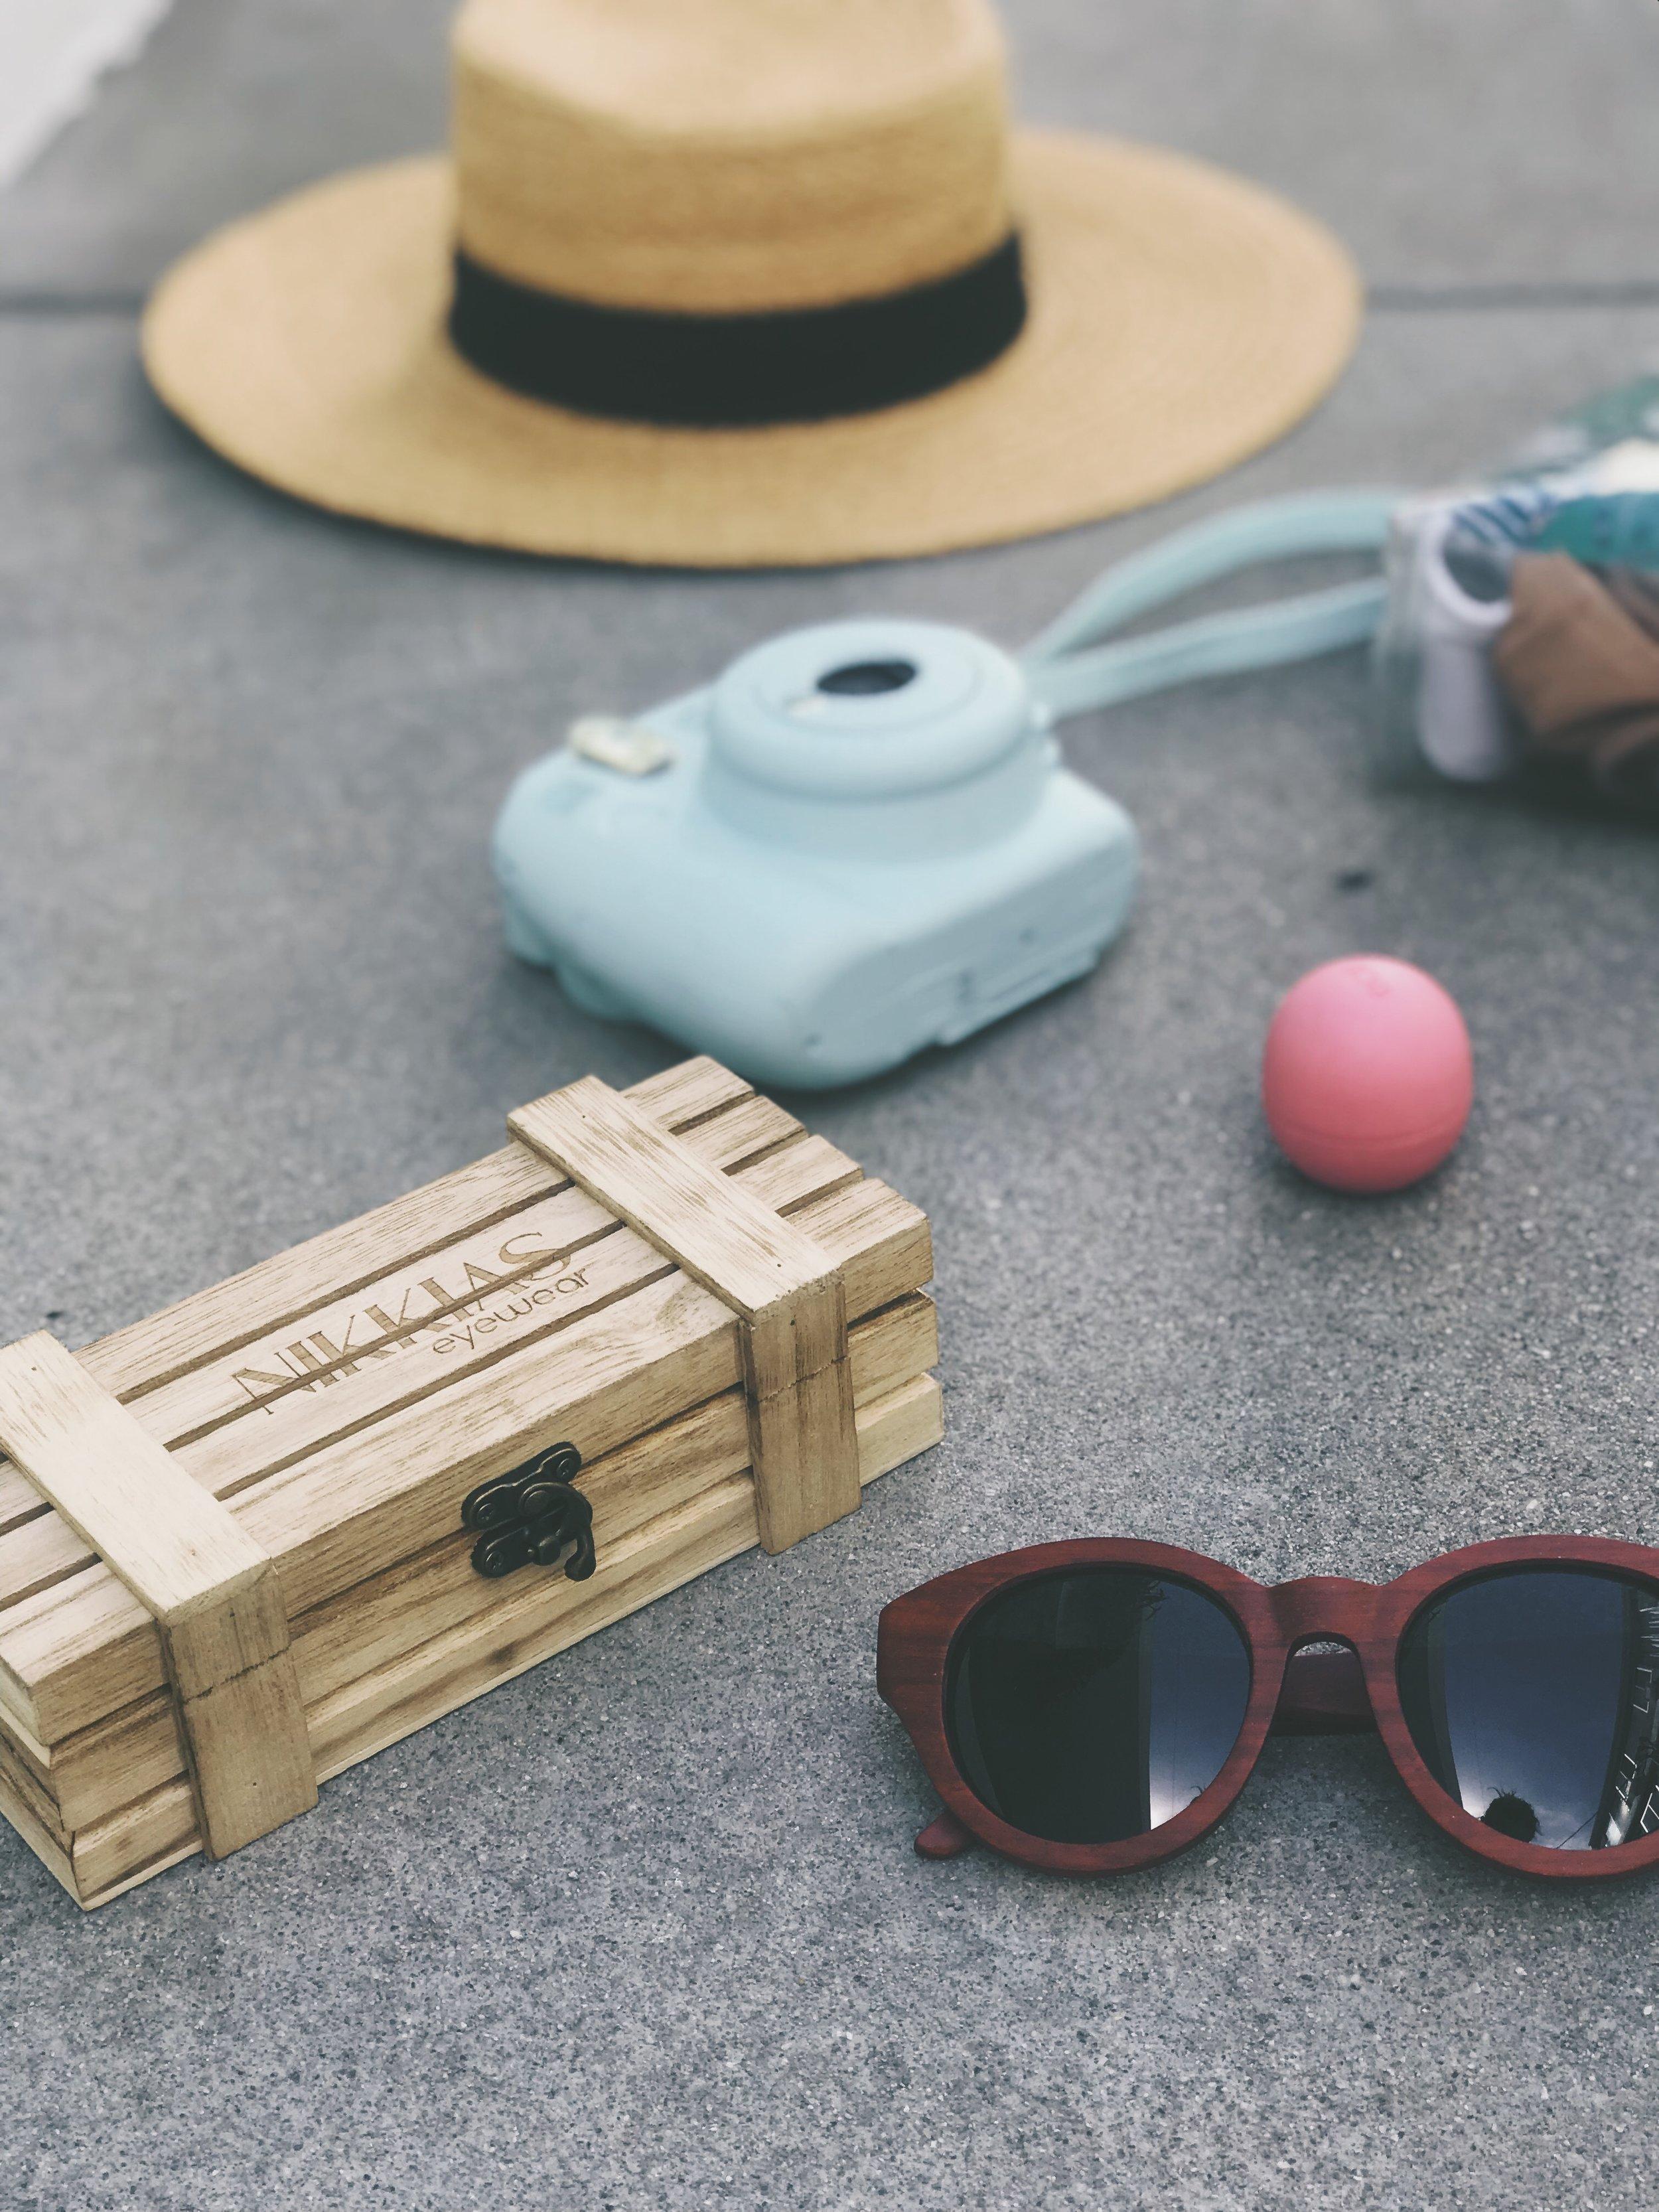 Sun, Bikini - and sunglasses